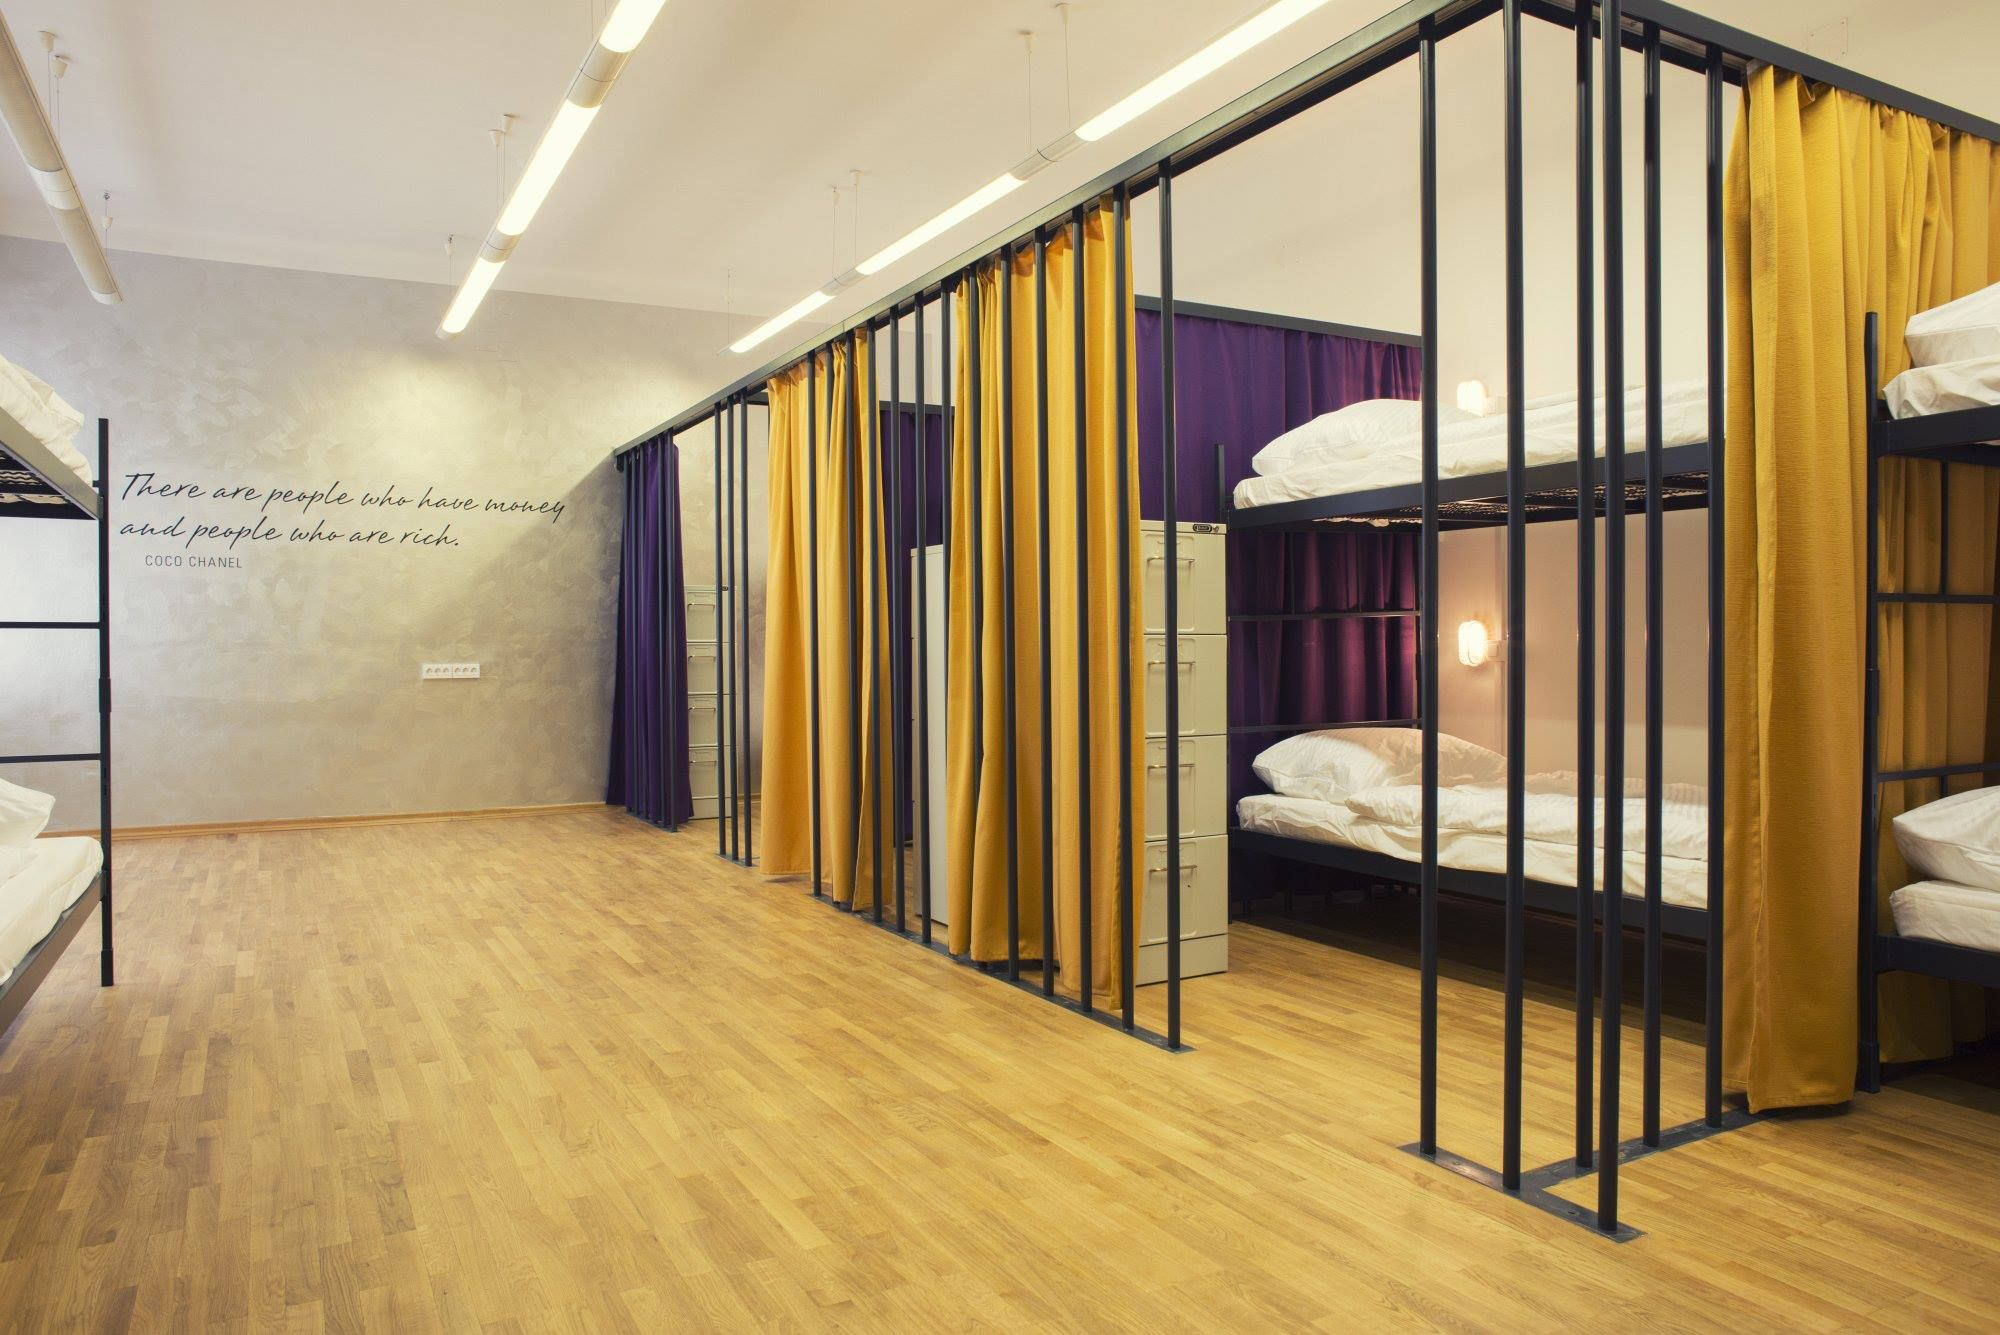 Design Hostel Tresor Ljubljana Slovenia Hostels Design Hostel Room Shelter Design